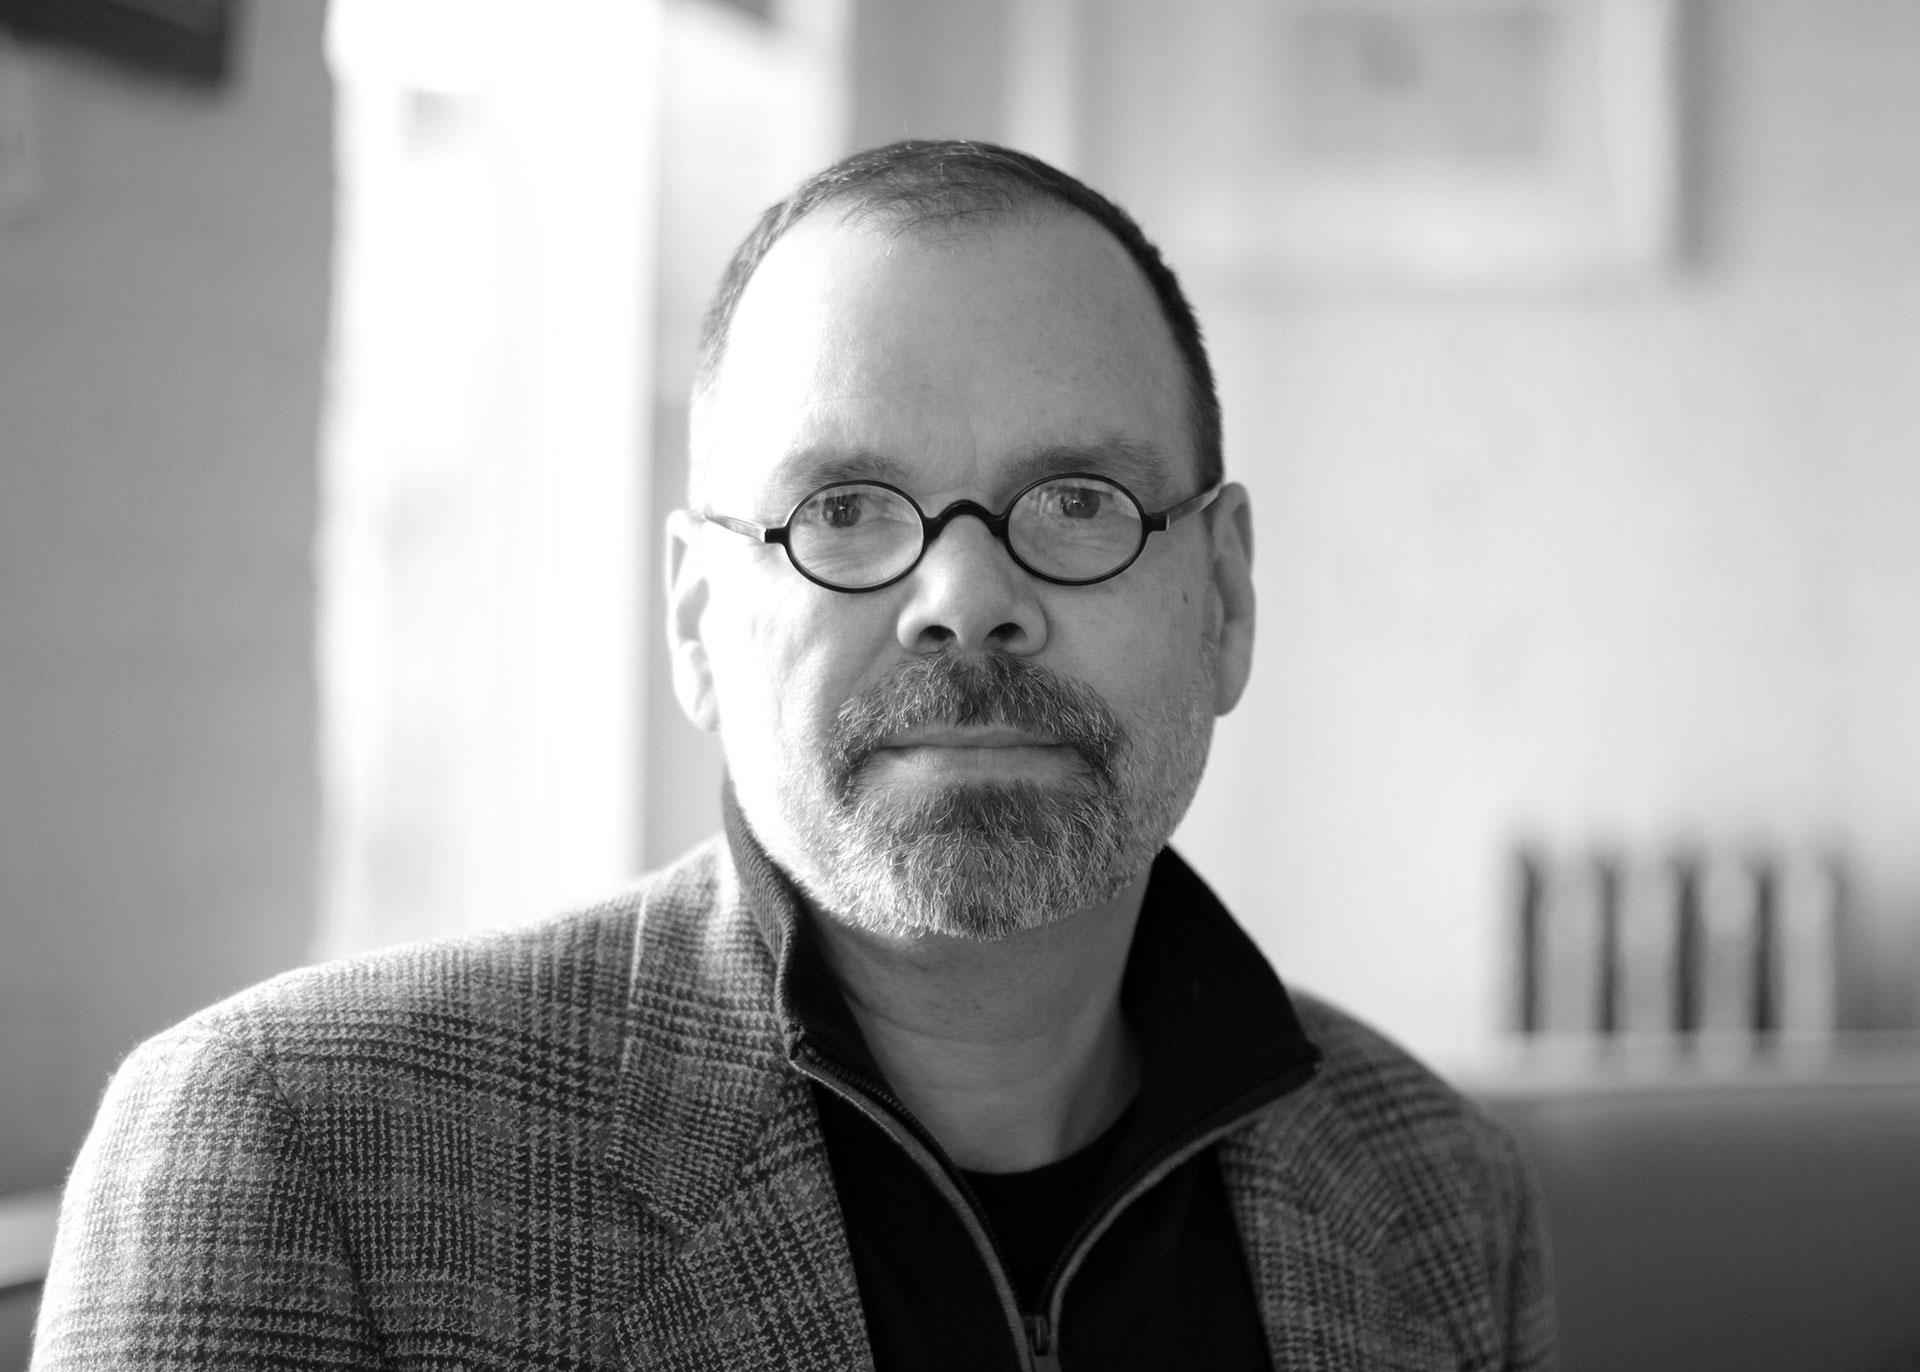 Headshot of How to Survive a Plague filmmaker David France